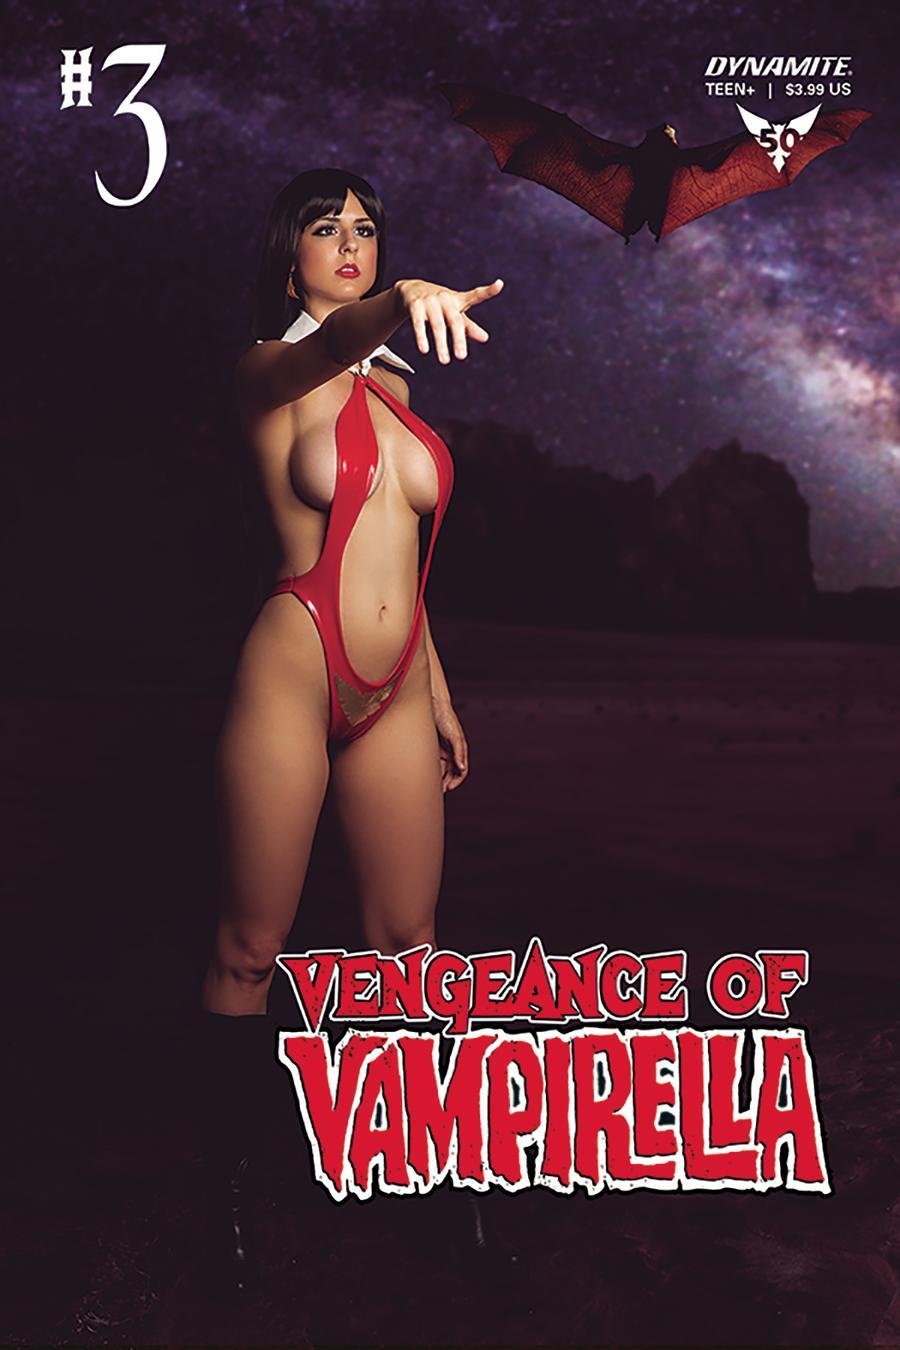 Vengeance Of Vampirella Vol 2 #3 Cover D Variant Cosplay Photo Cover